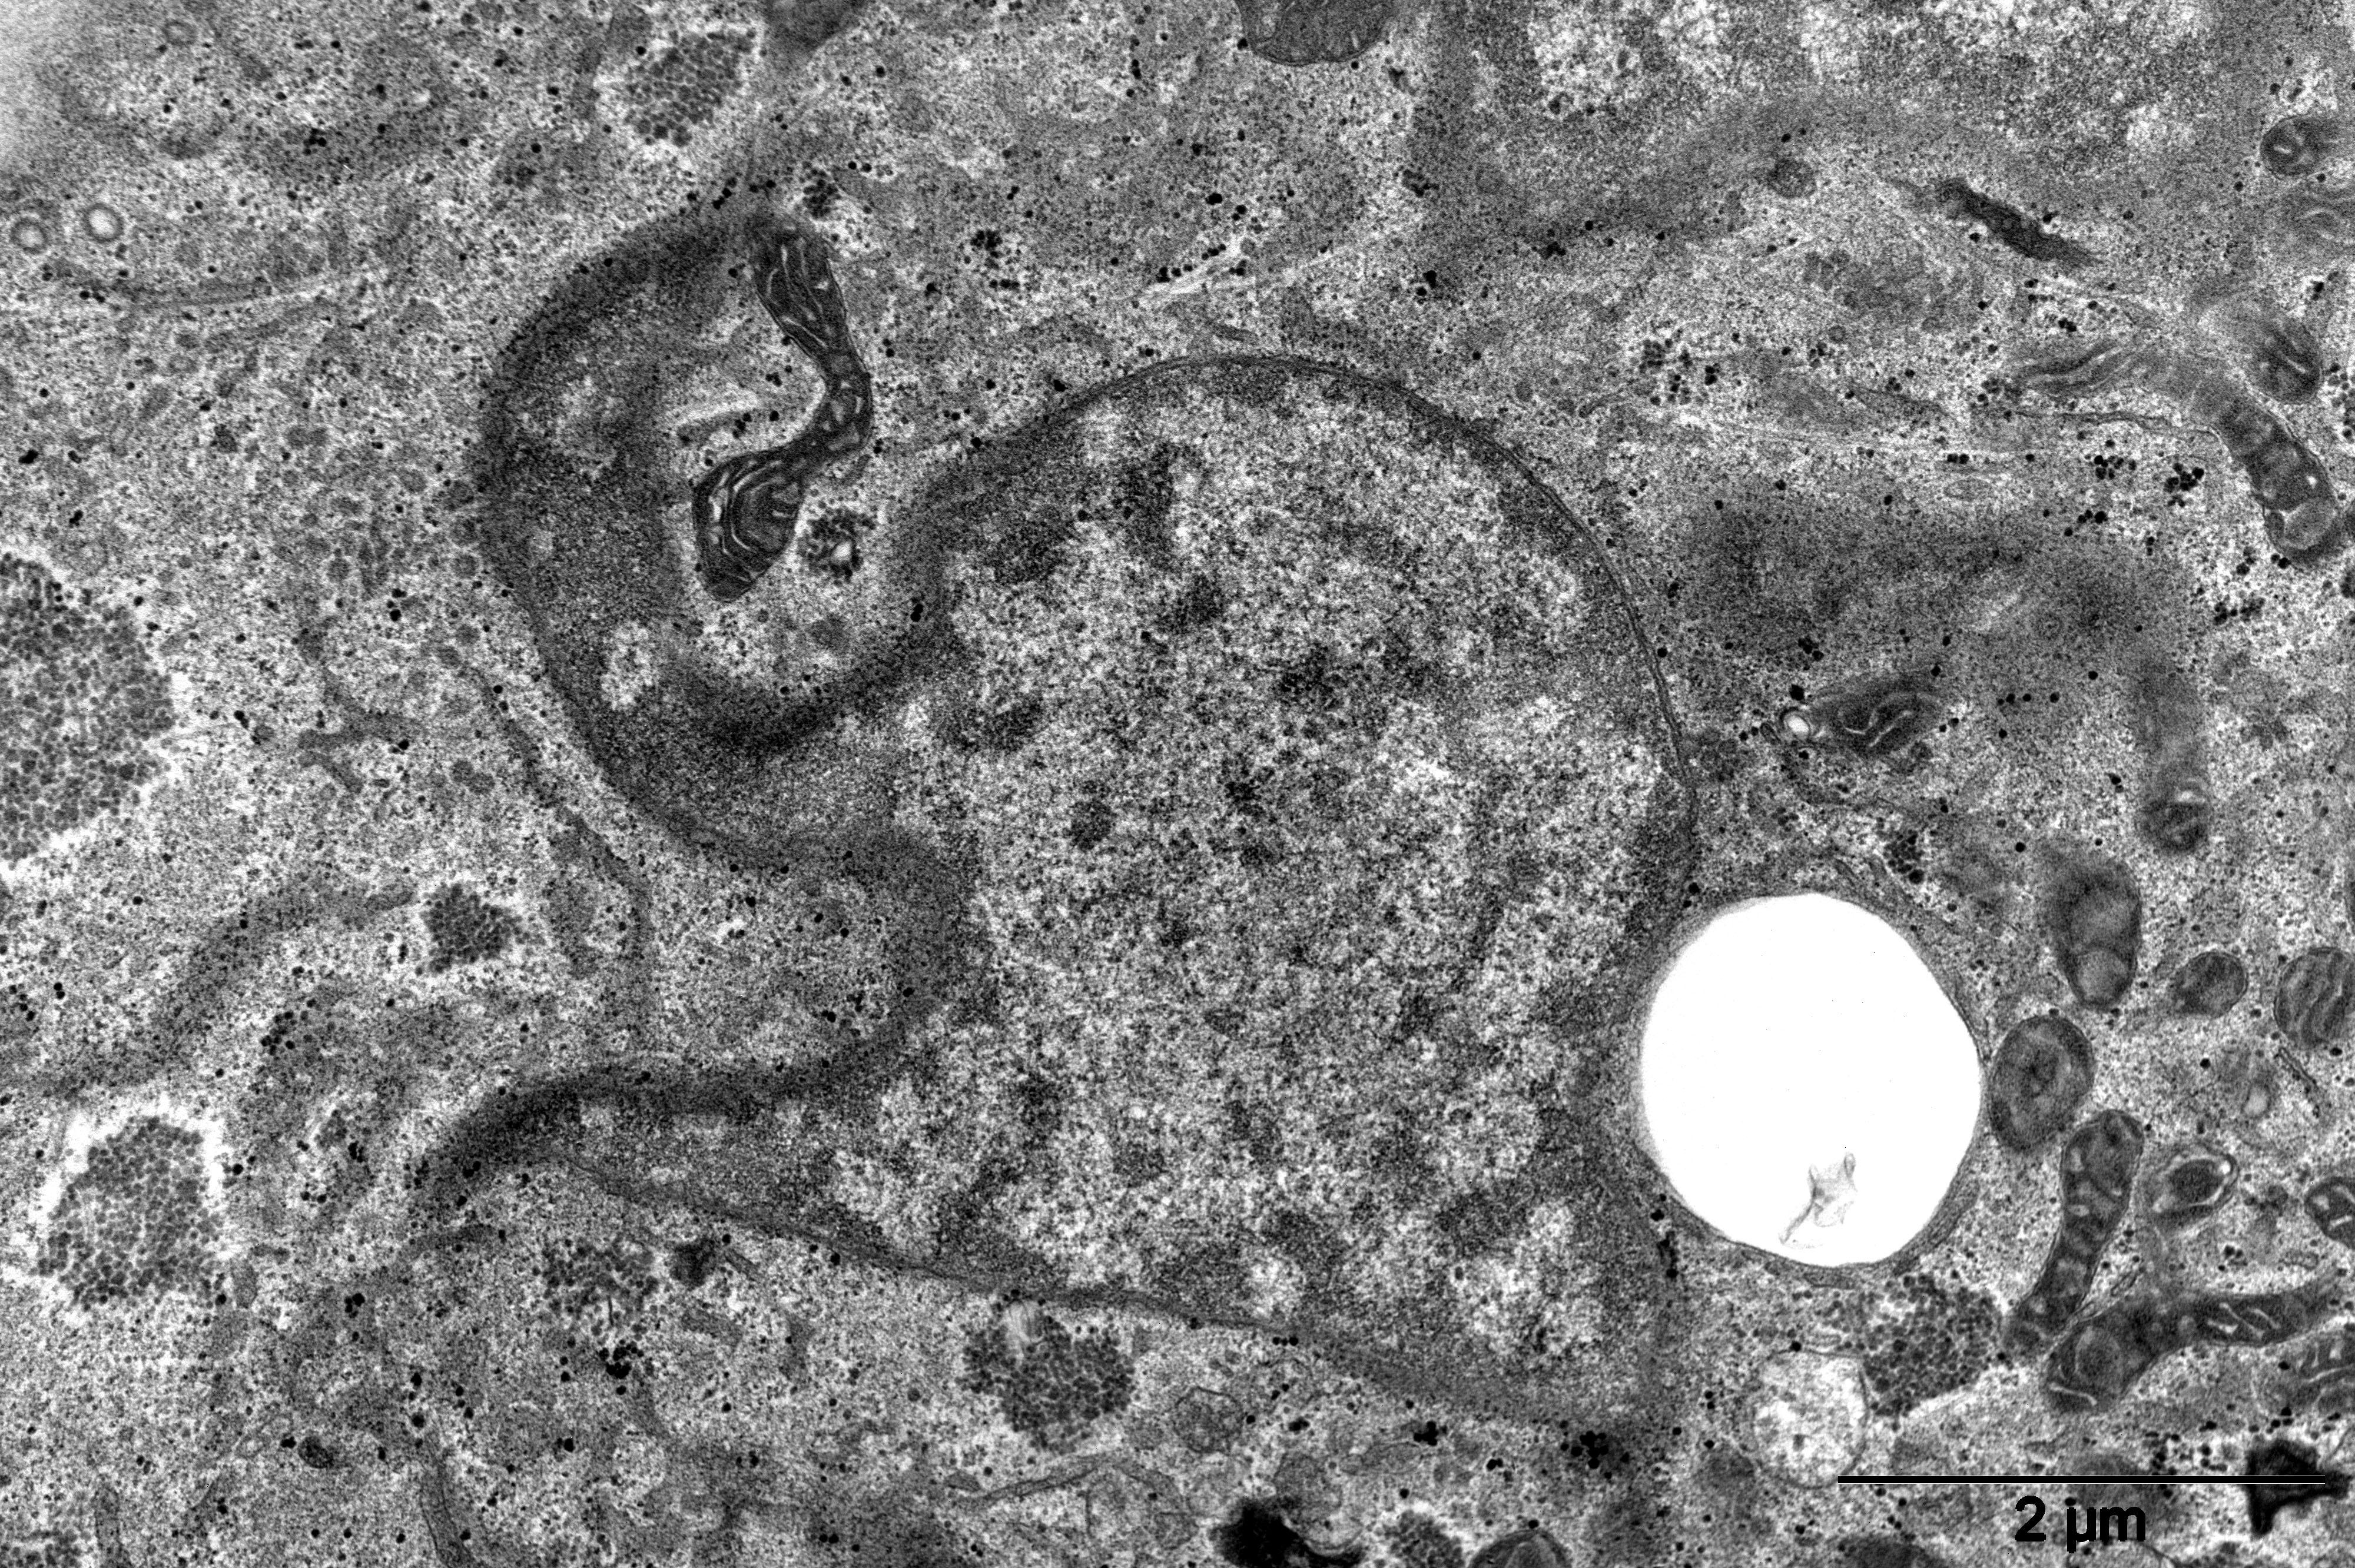 119 - Elephantus nucleus